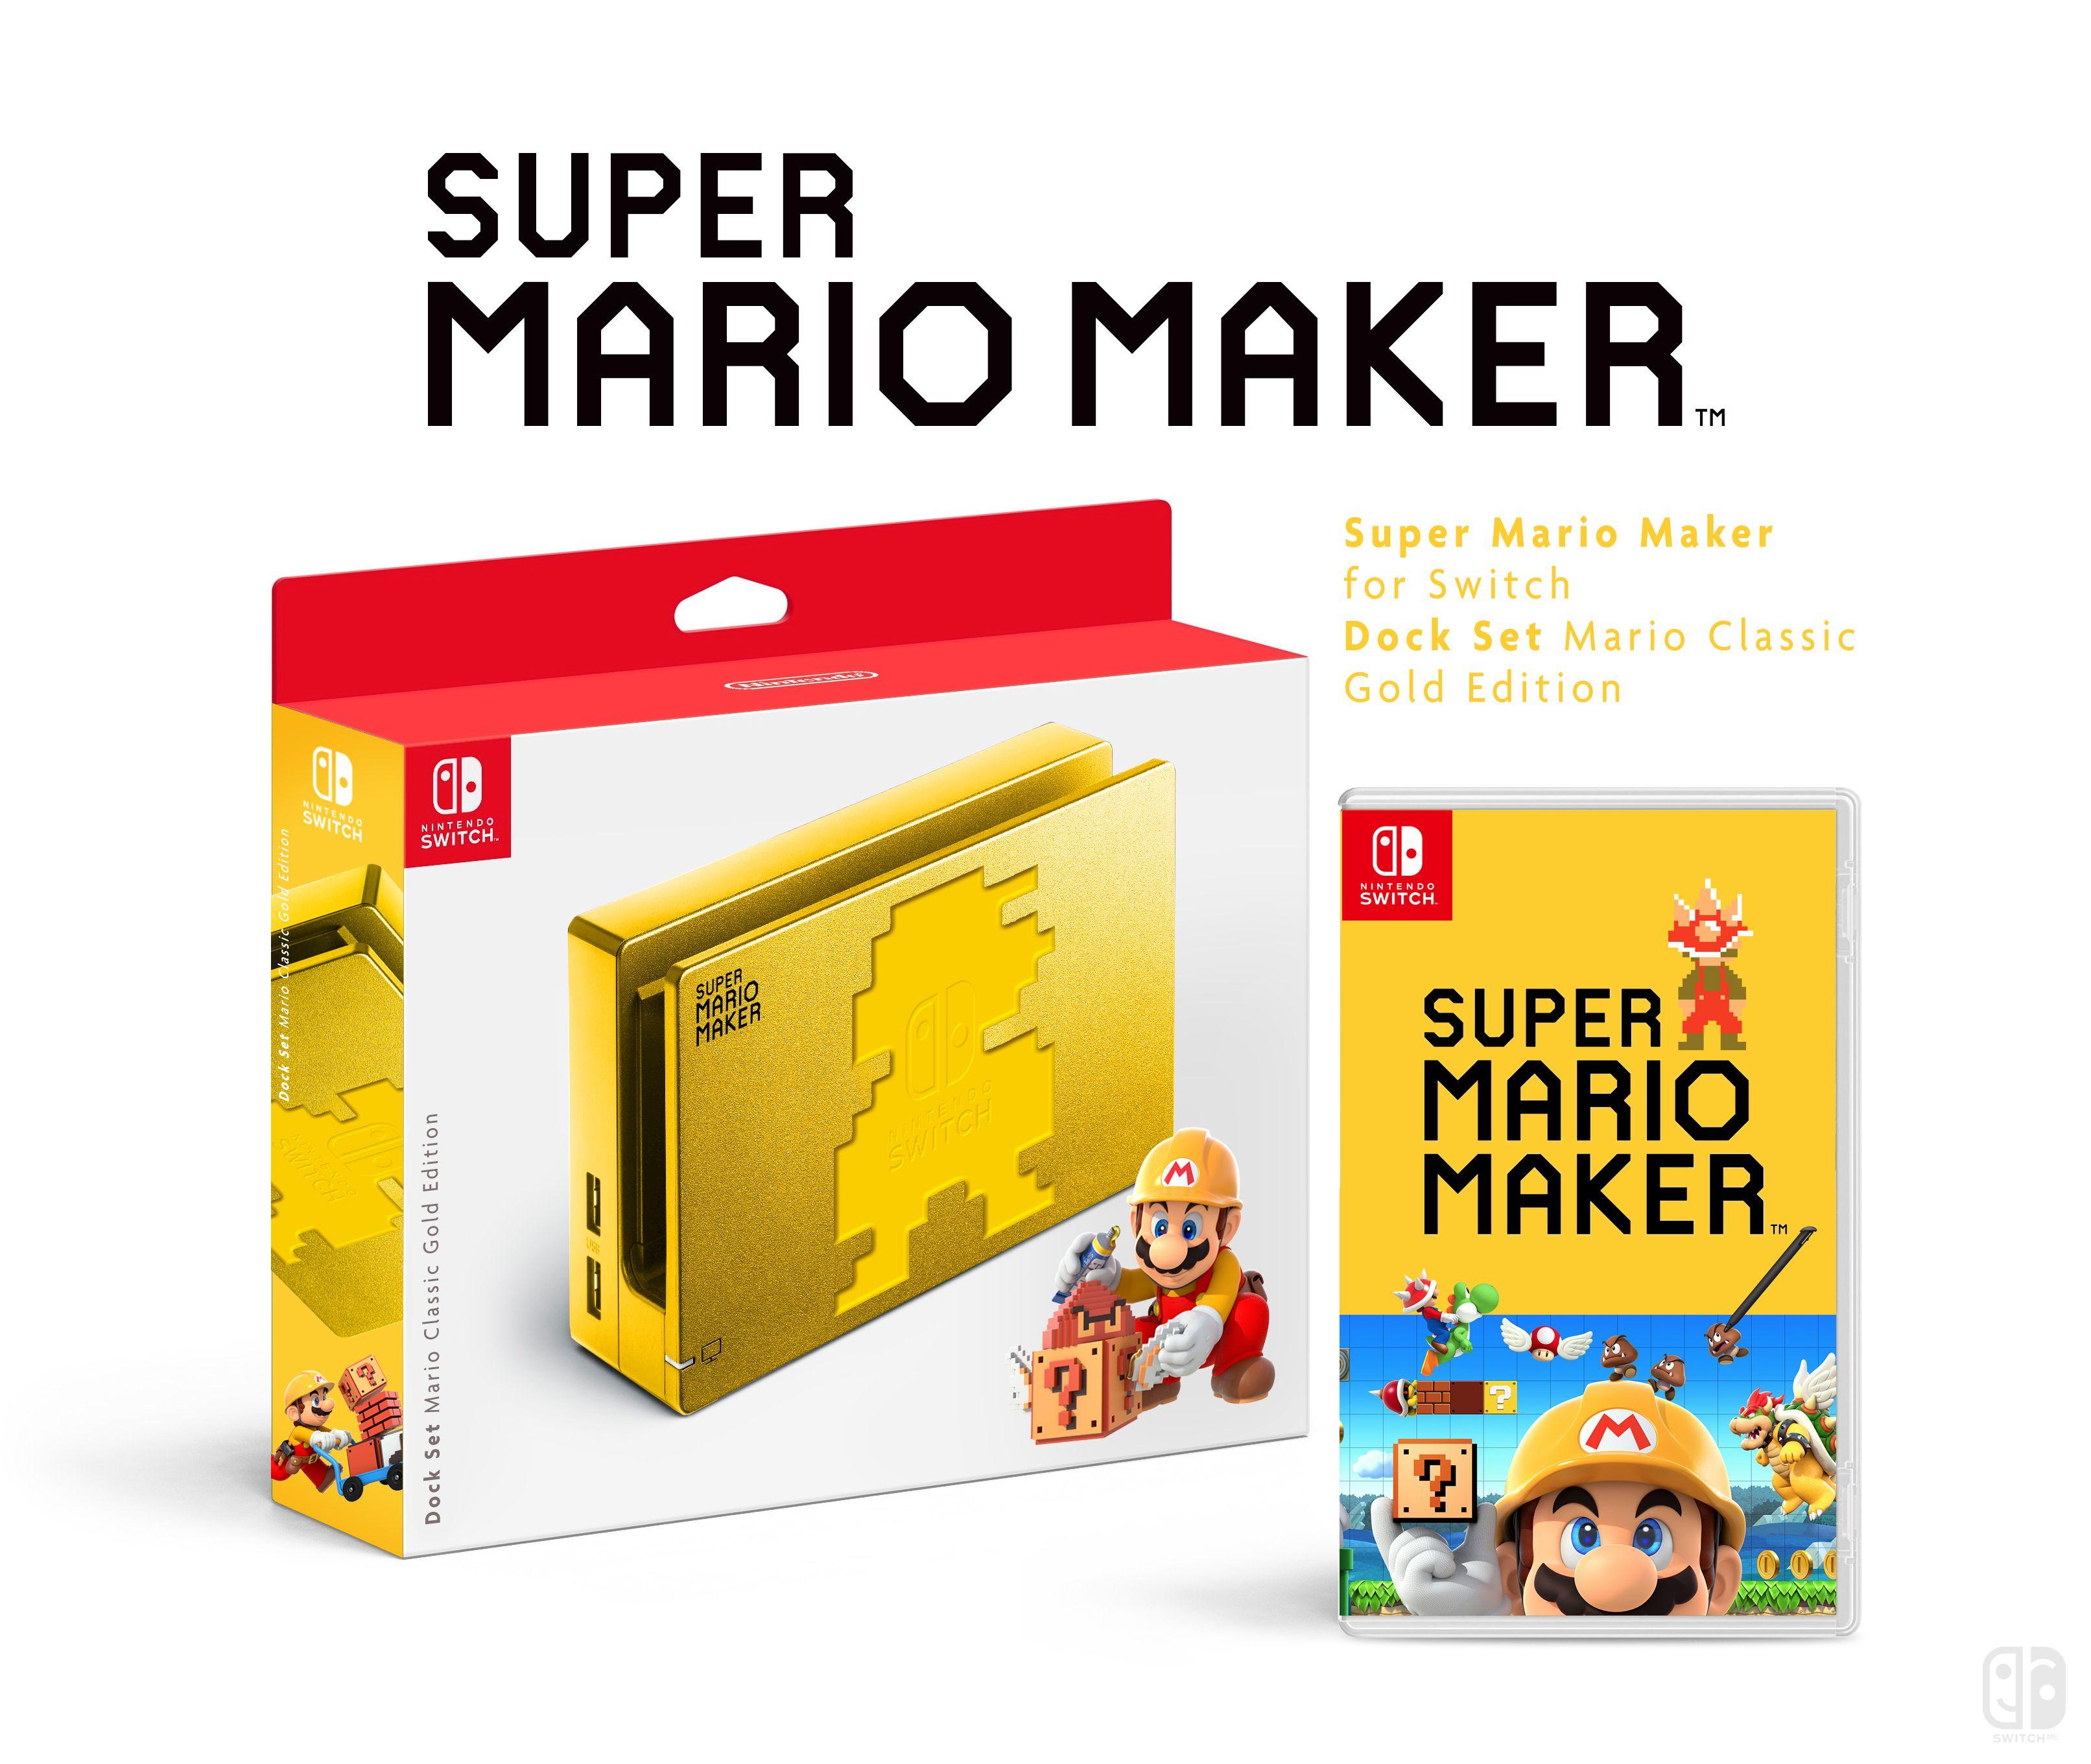 Dock set mario classic gold super mario maker nintendo